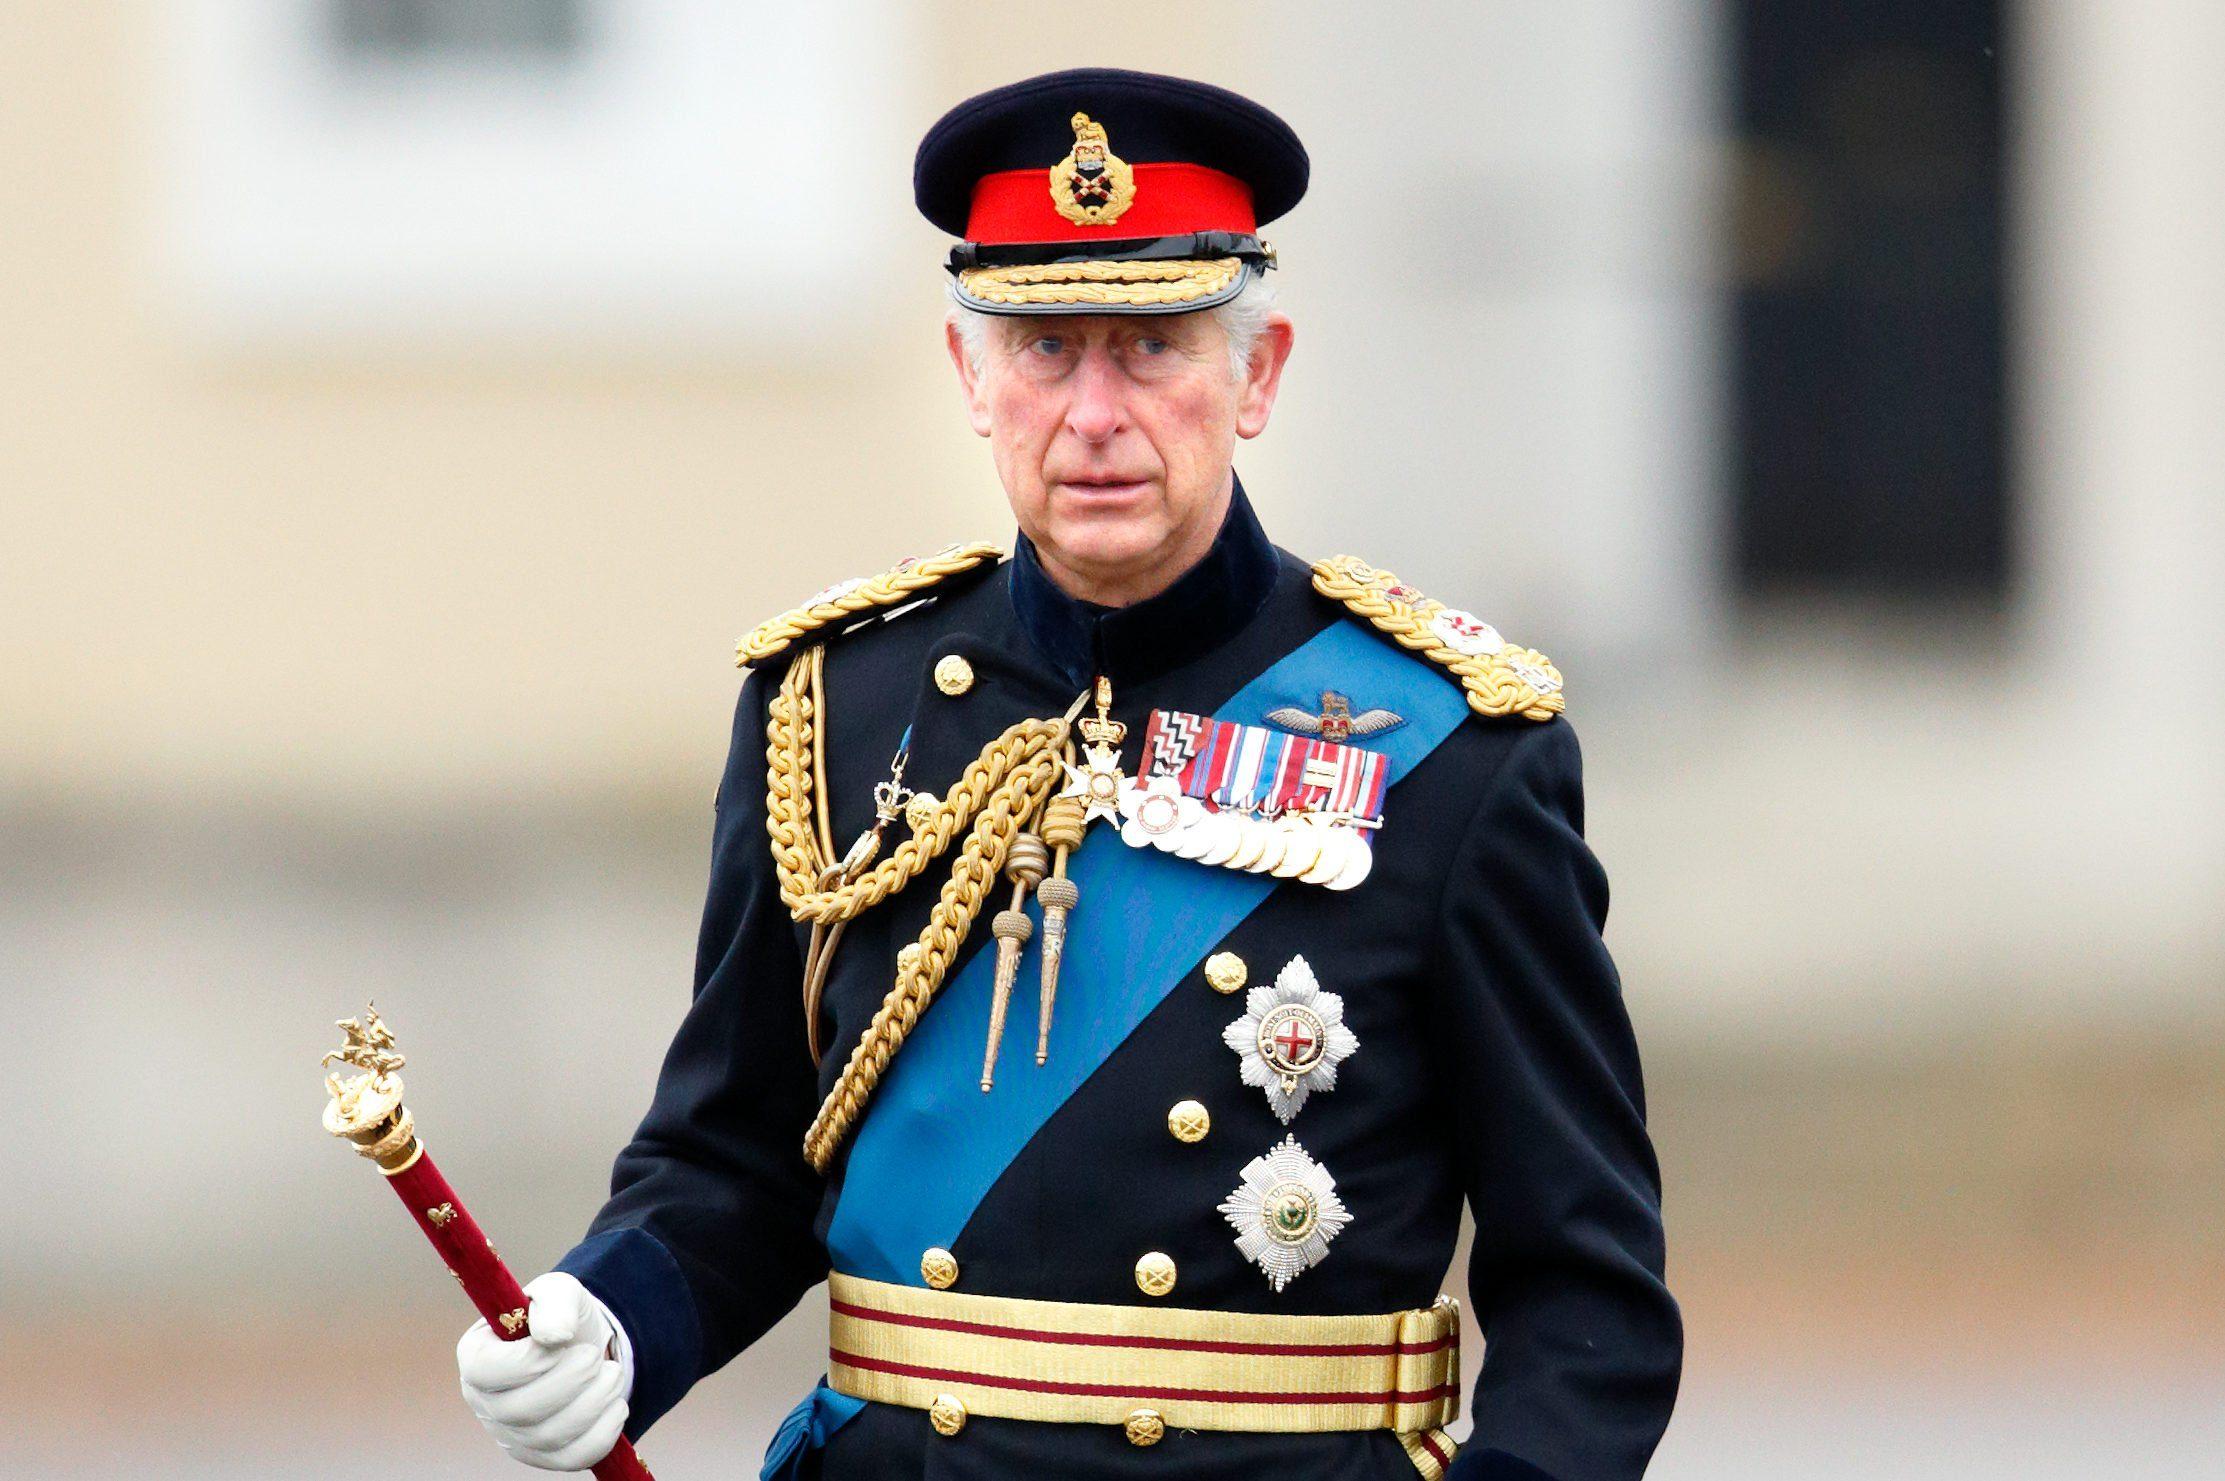 Prince Charles in royal regalia